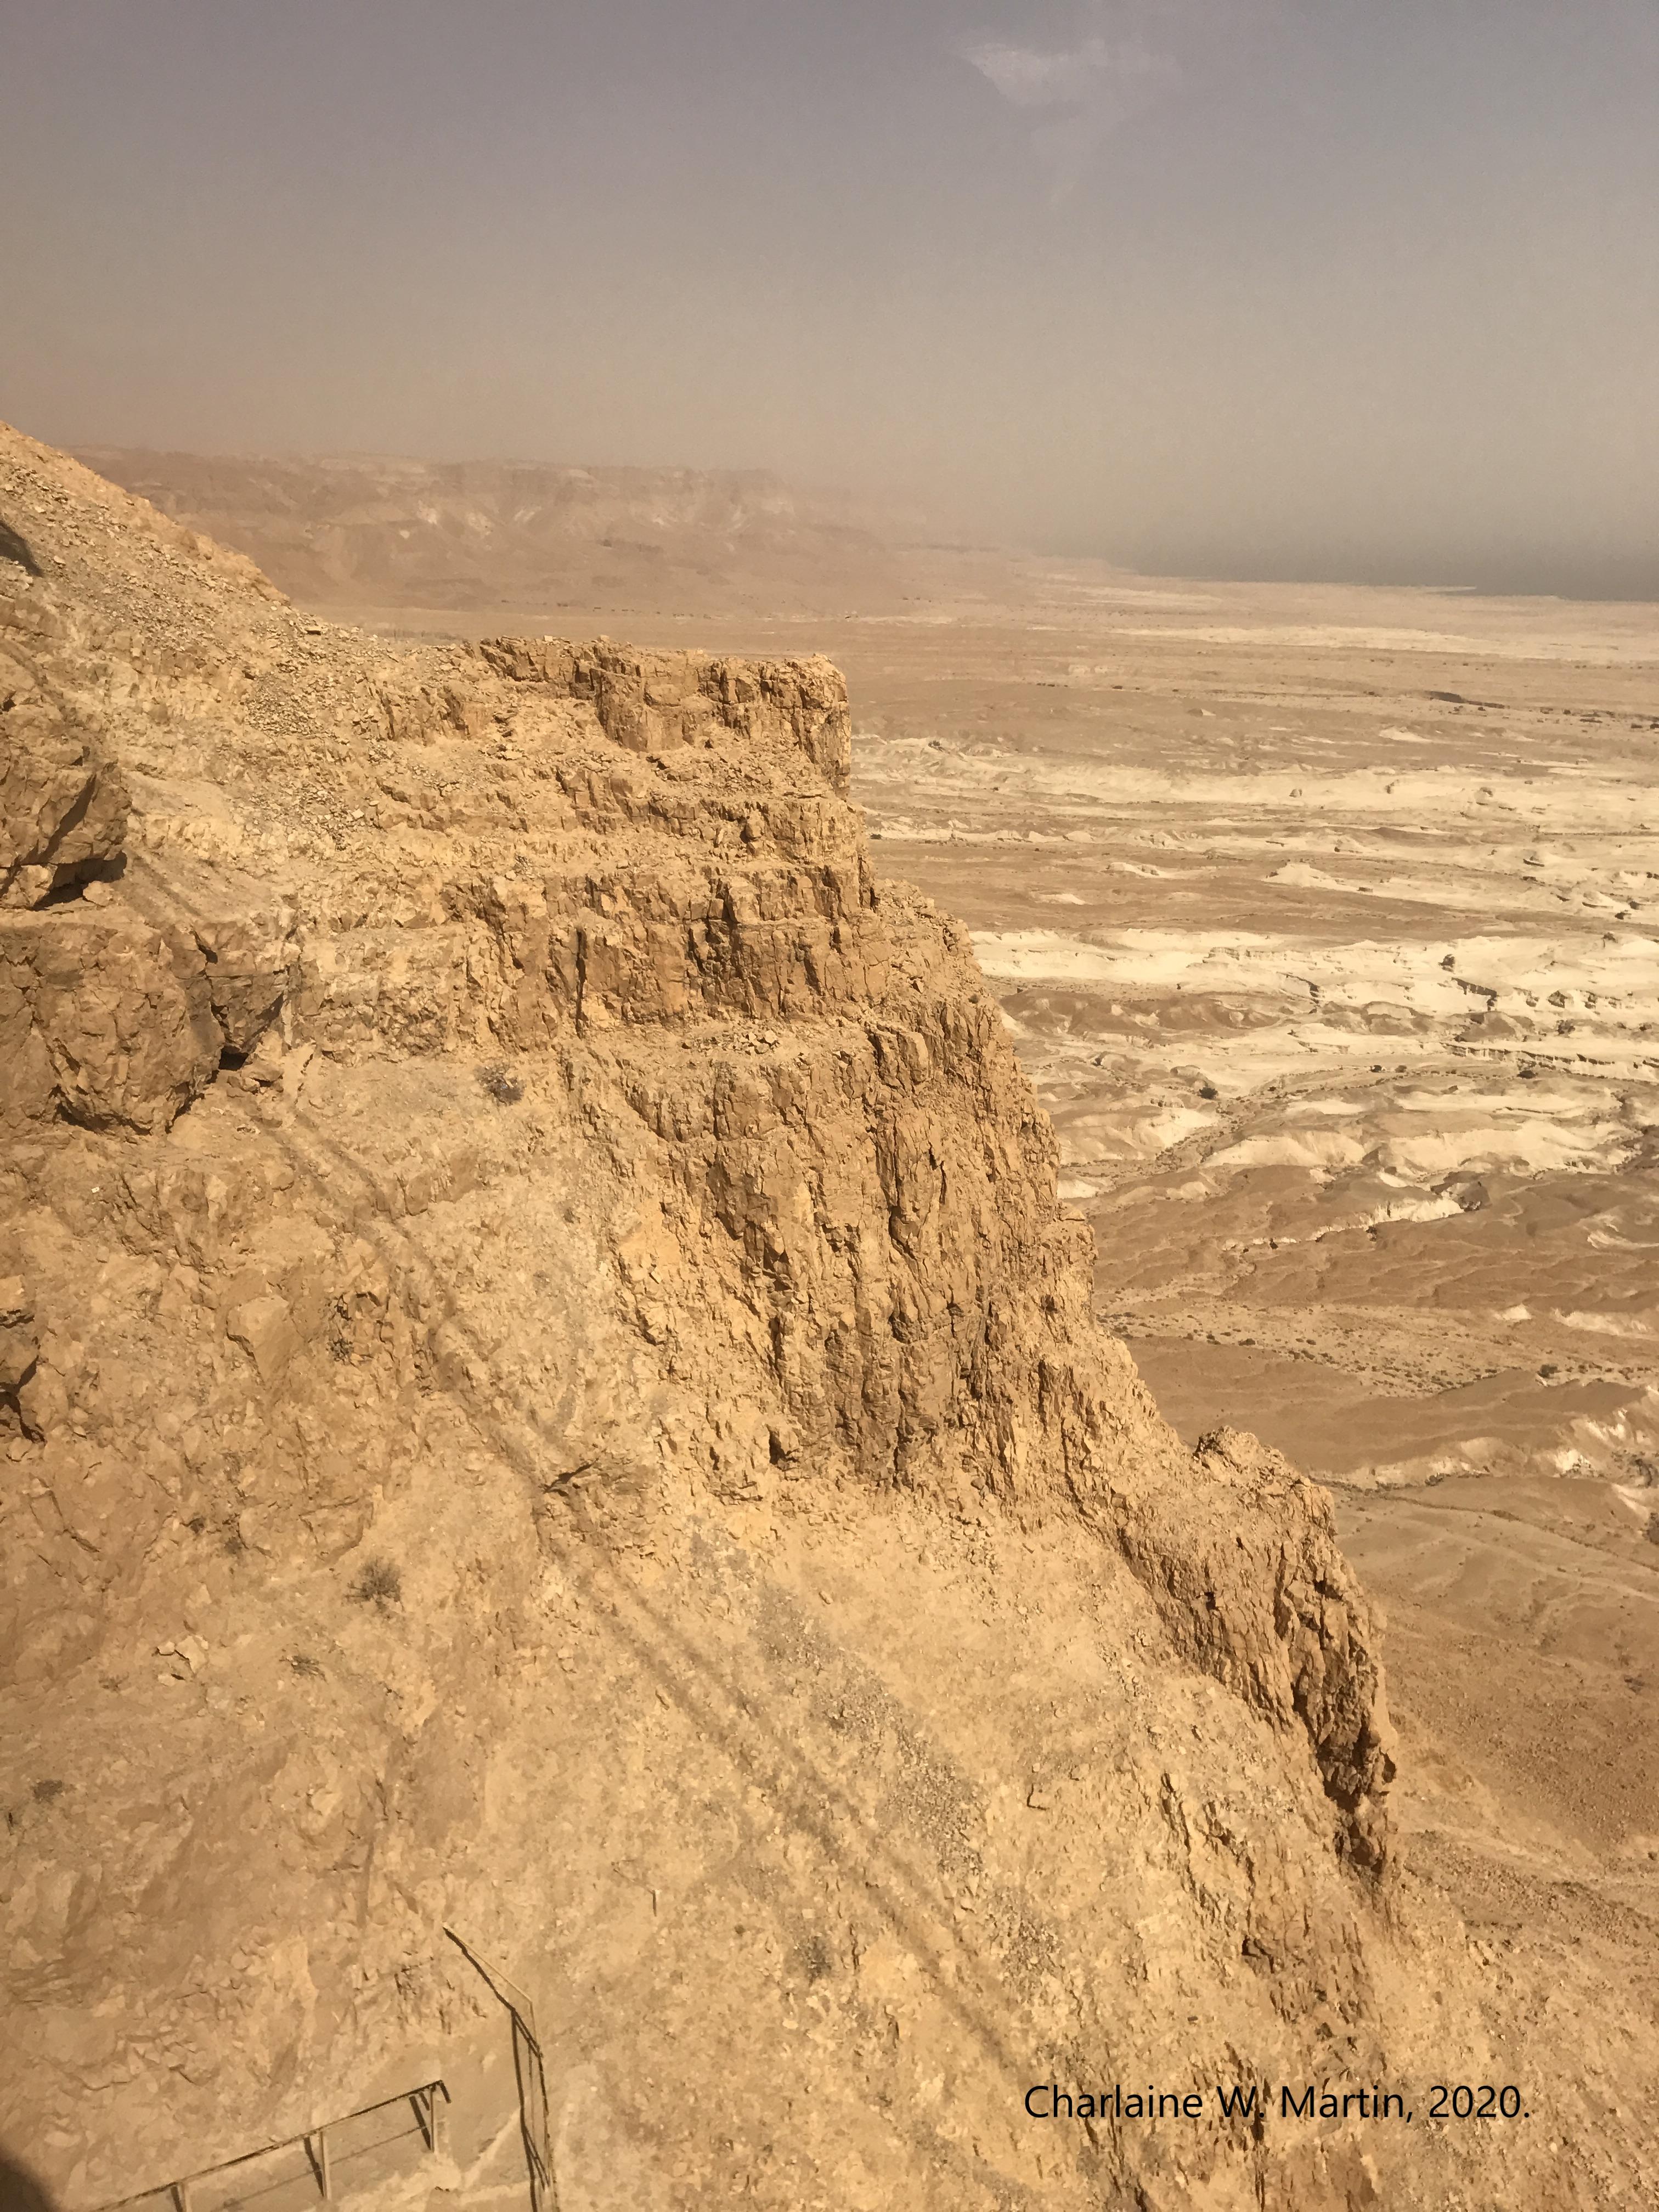 Seeking Relief in a Spiritual Desert